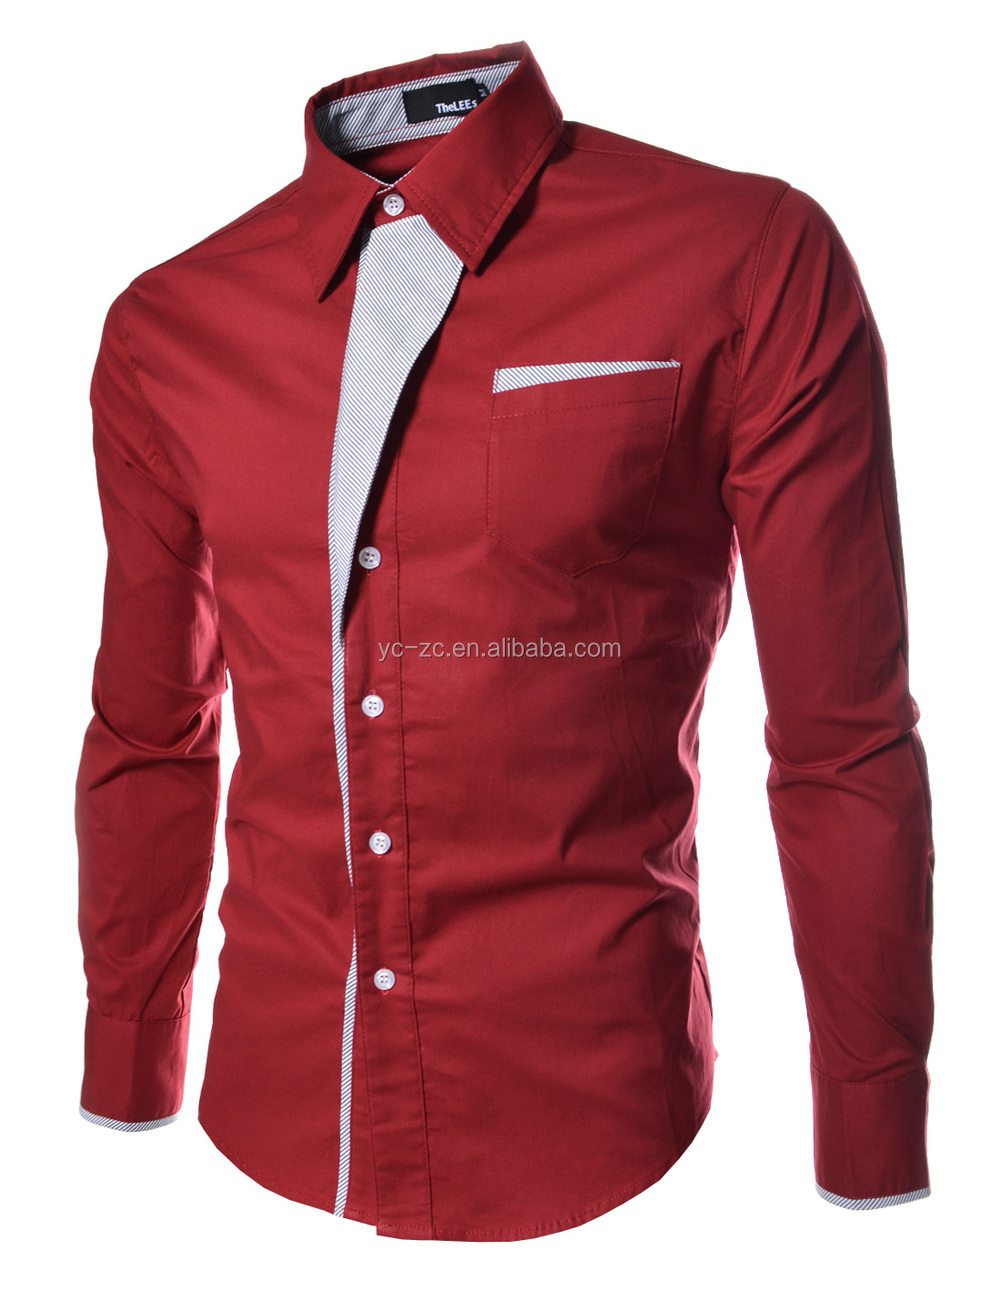 Shirt design of 2014 - 2015 New Design Best Quality Men Shirts 2014 Italian Design Buy Men Shirts 2014 Italian Design Men Shirts Cotton Fabric Men Shirt Cutting Product On